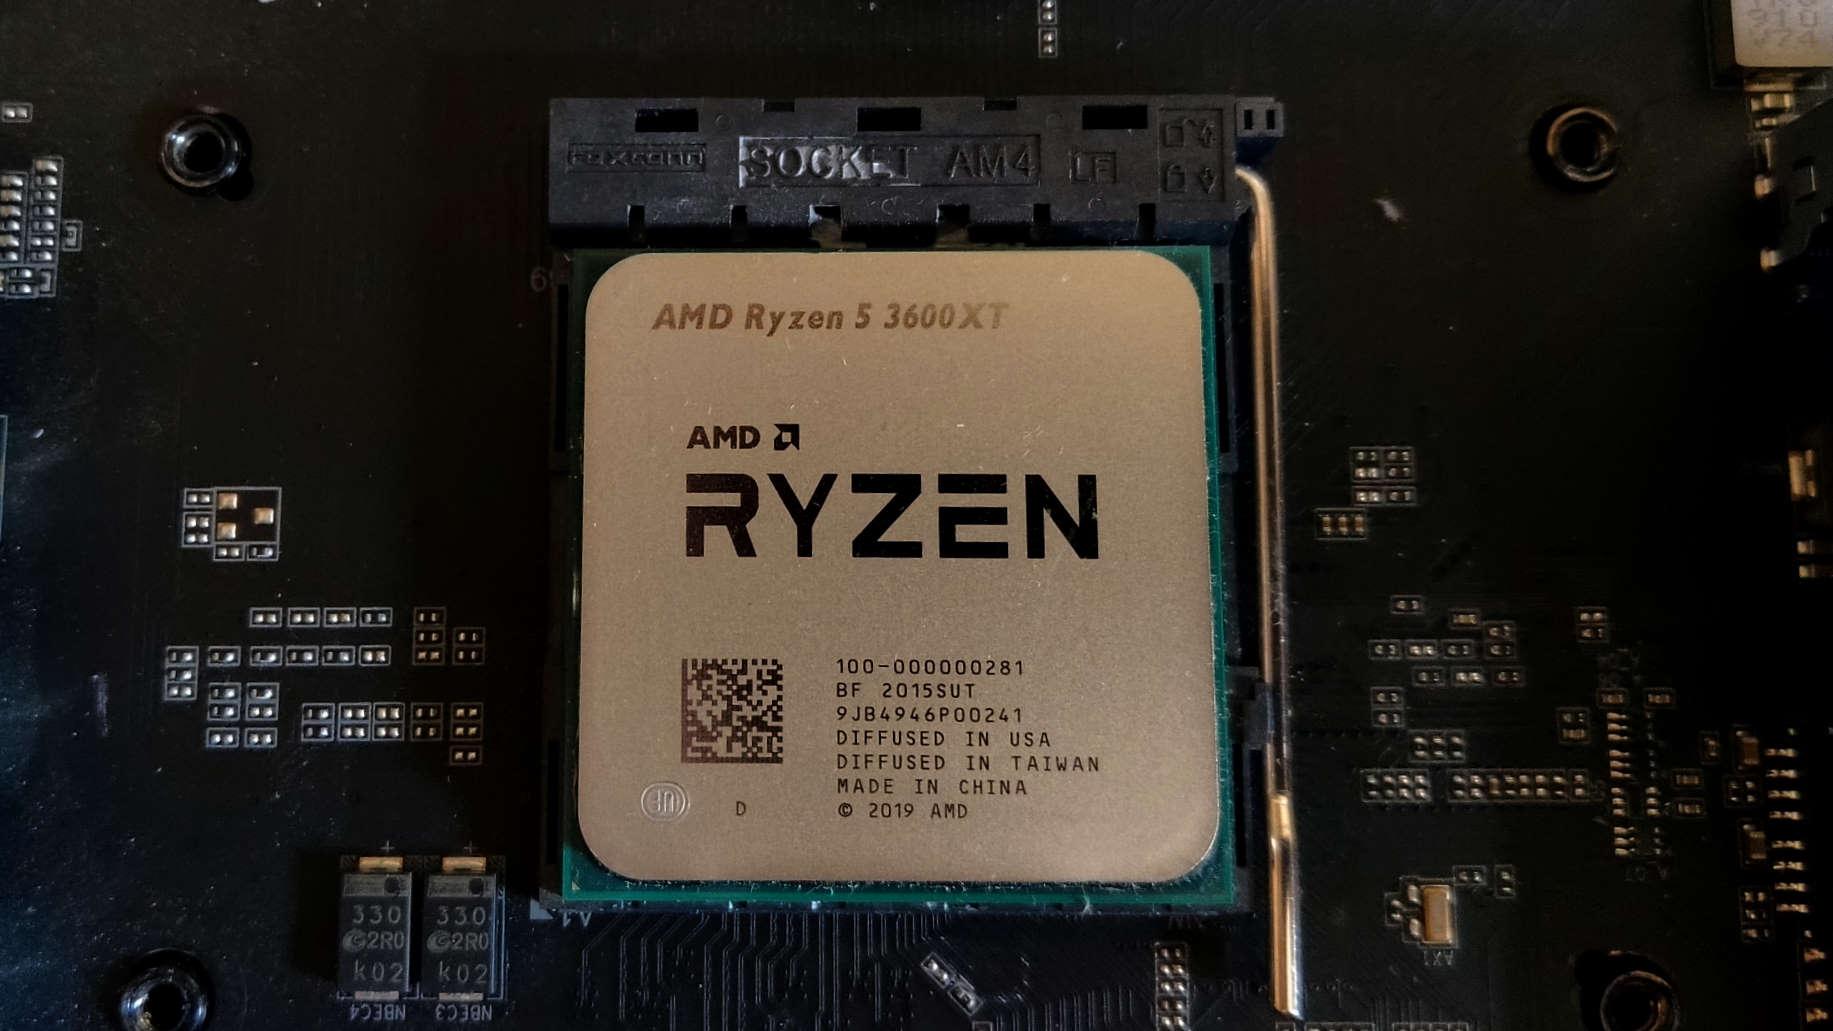 Amd Ryzen 5 3600xt Overclocking Probably The Best Ryzen For Oc Pc Gamer